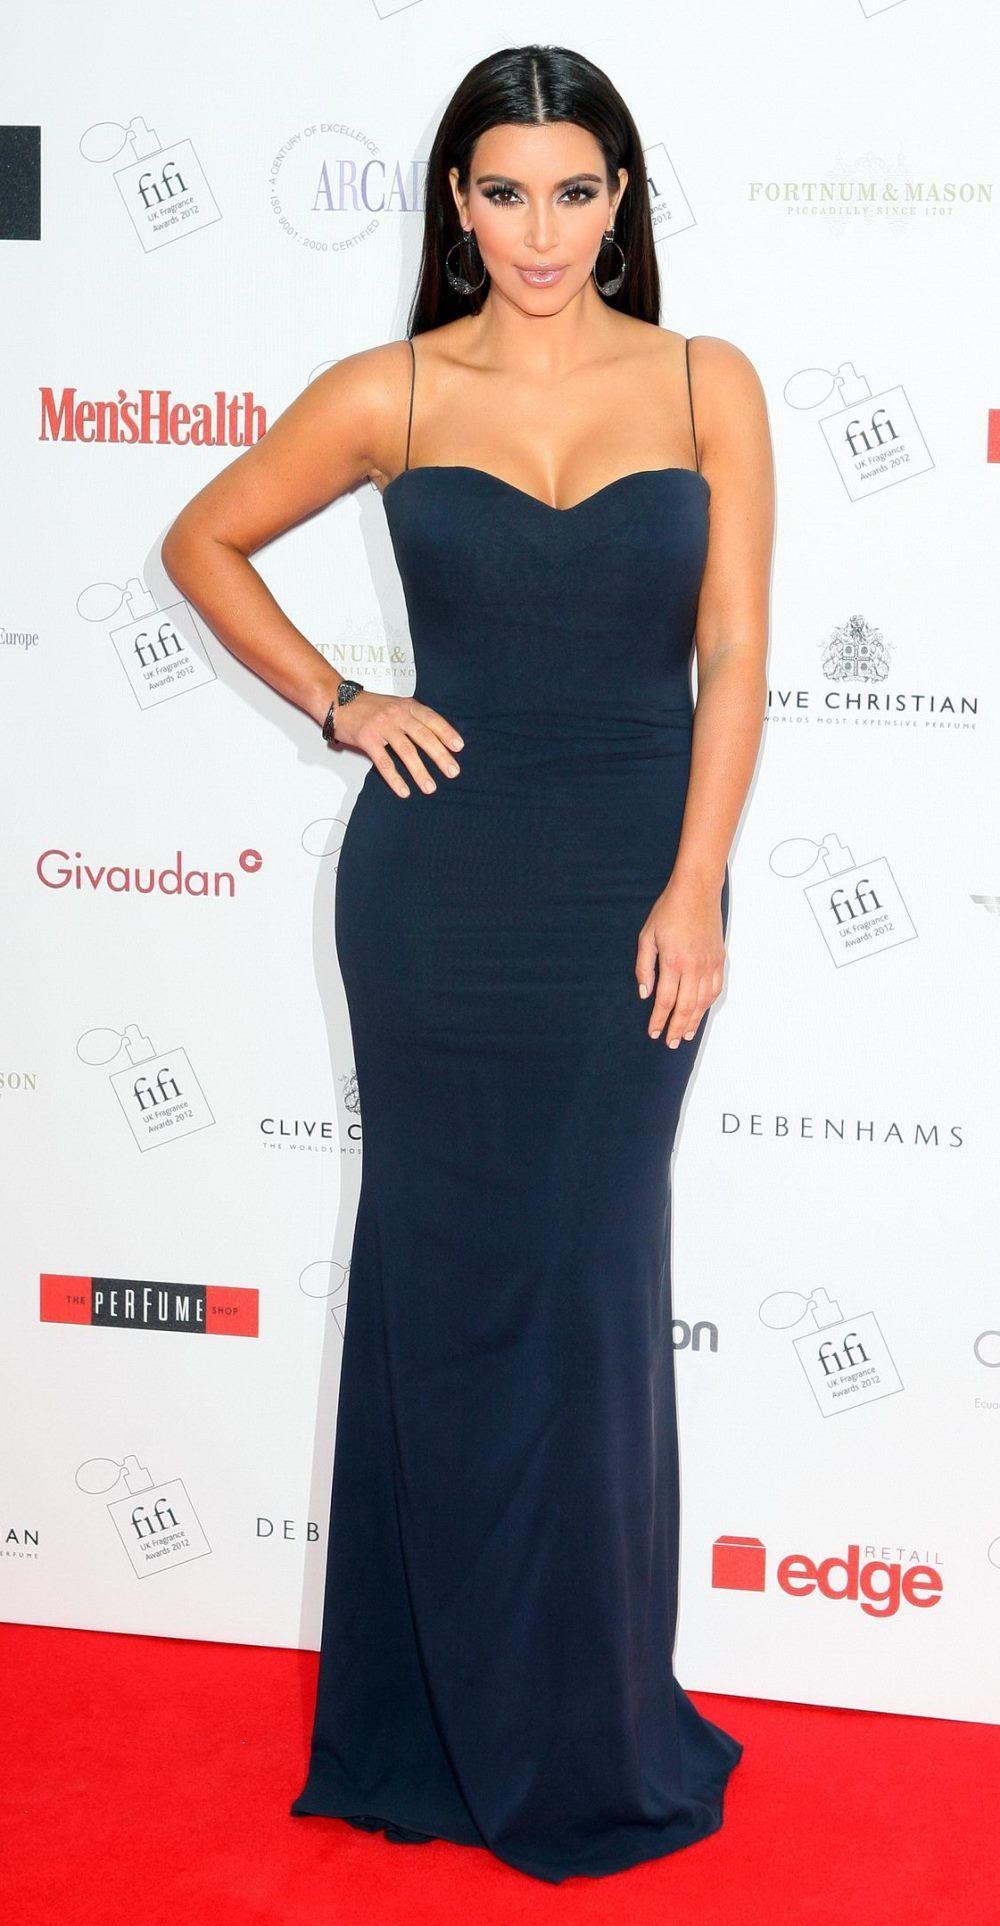 Pin von Fashion Dolling auf Kim Kardashian | Pinterest